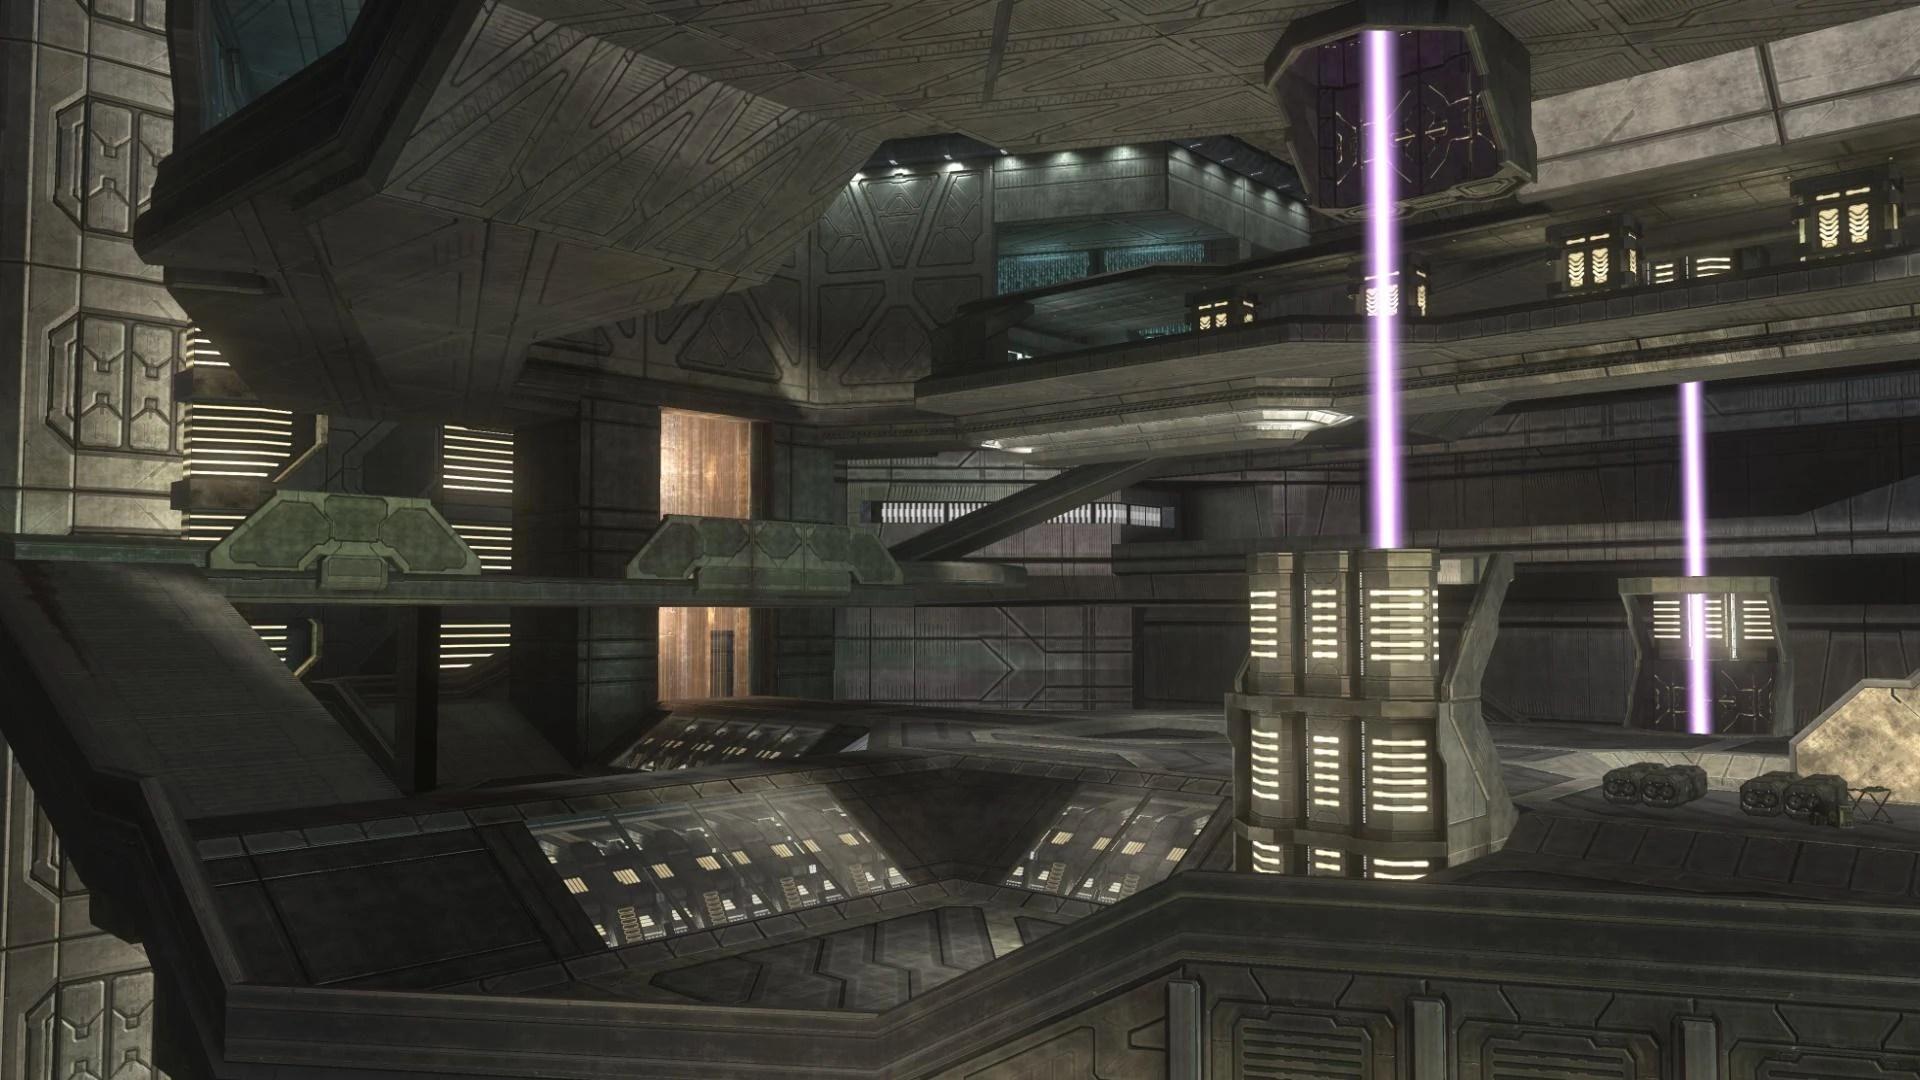 Halo Reach 3d Wallpaper Pc Construct Level Halo Nation The Halo Encyclopedia